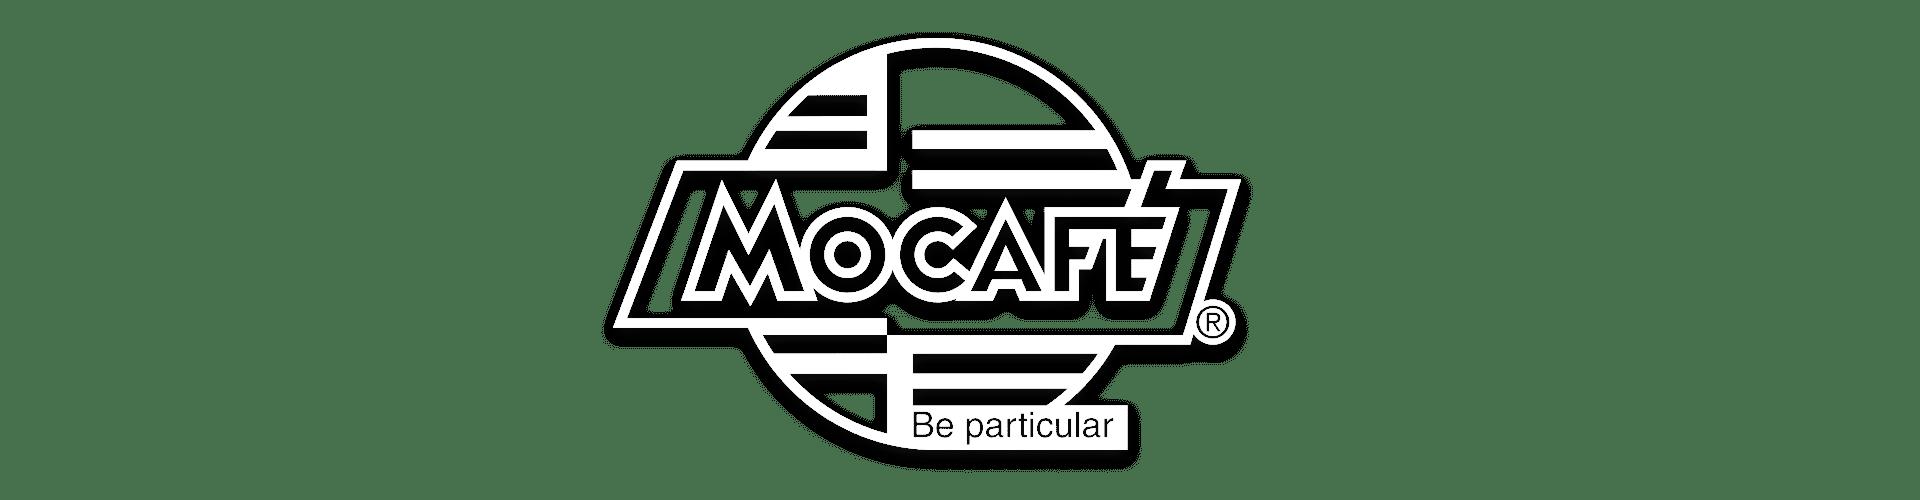 Mocafe Slider Pallarax Titulo